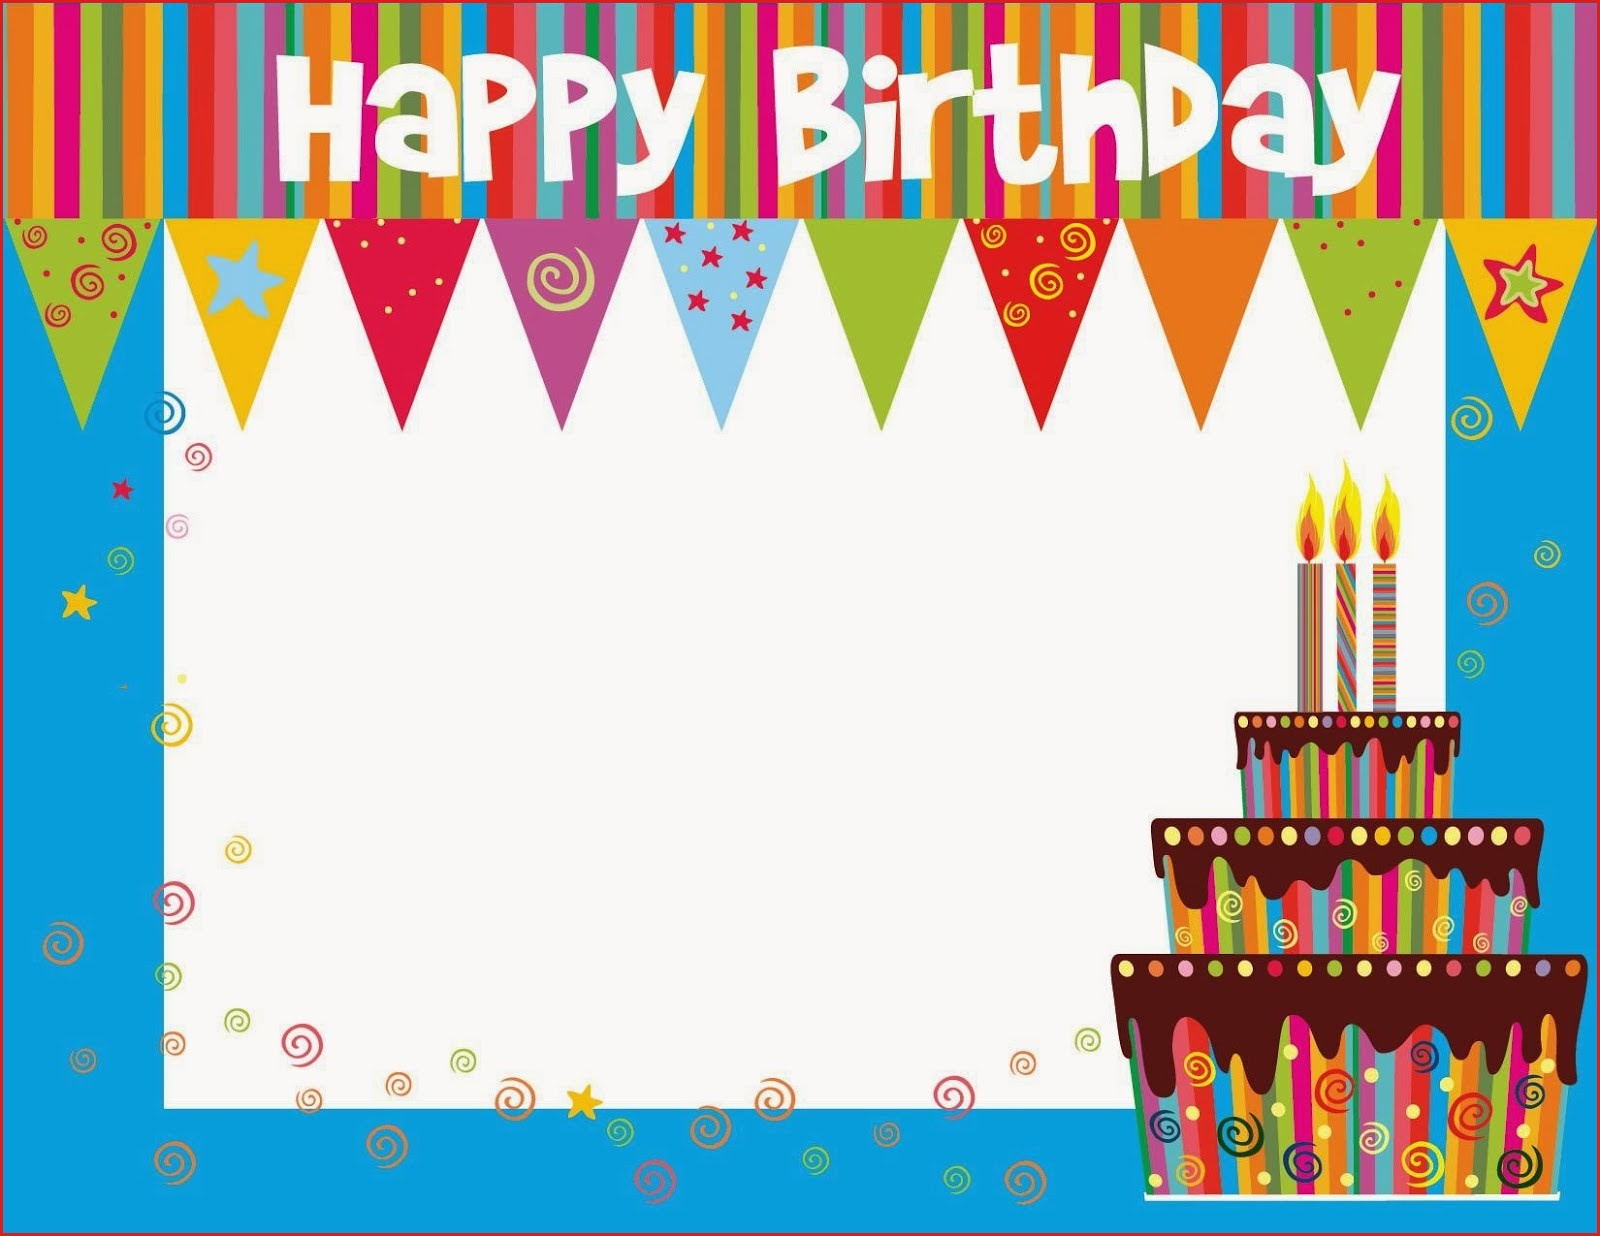 Create Birthday Cards Online Free Printable Birthday Cards Ideas - Free Printable Cards Online